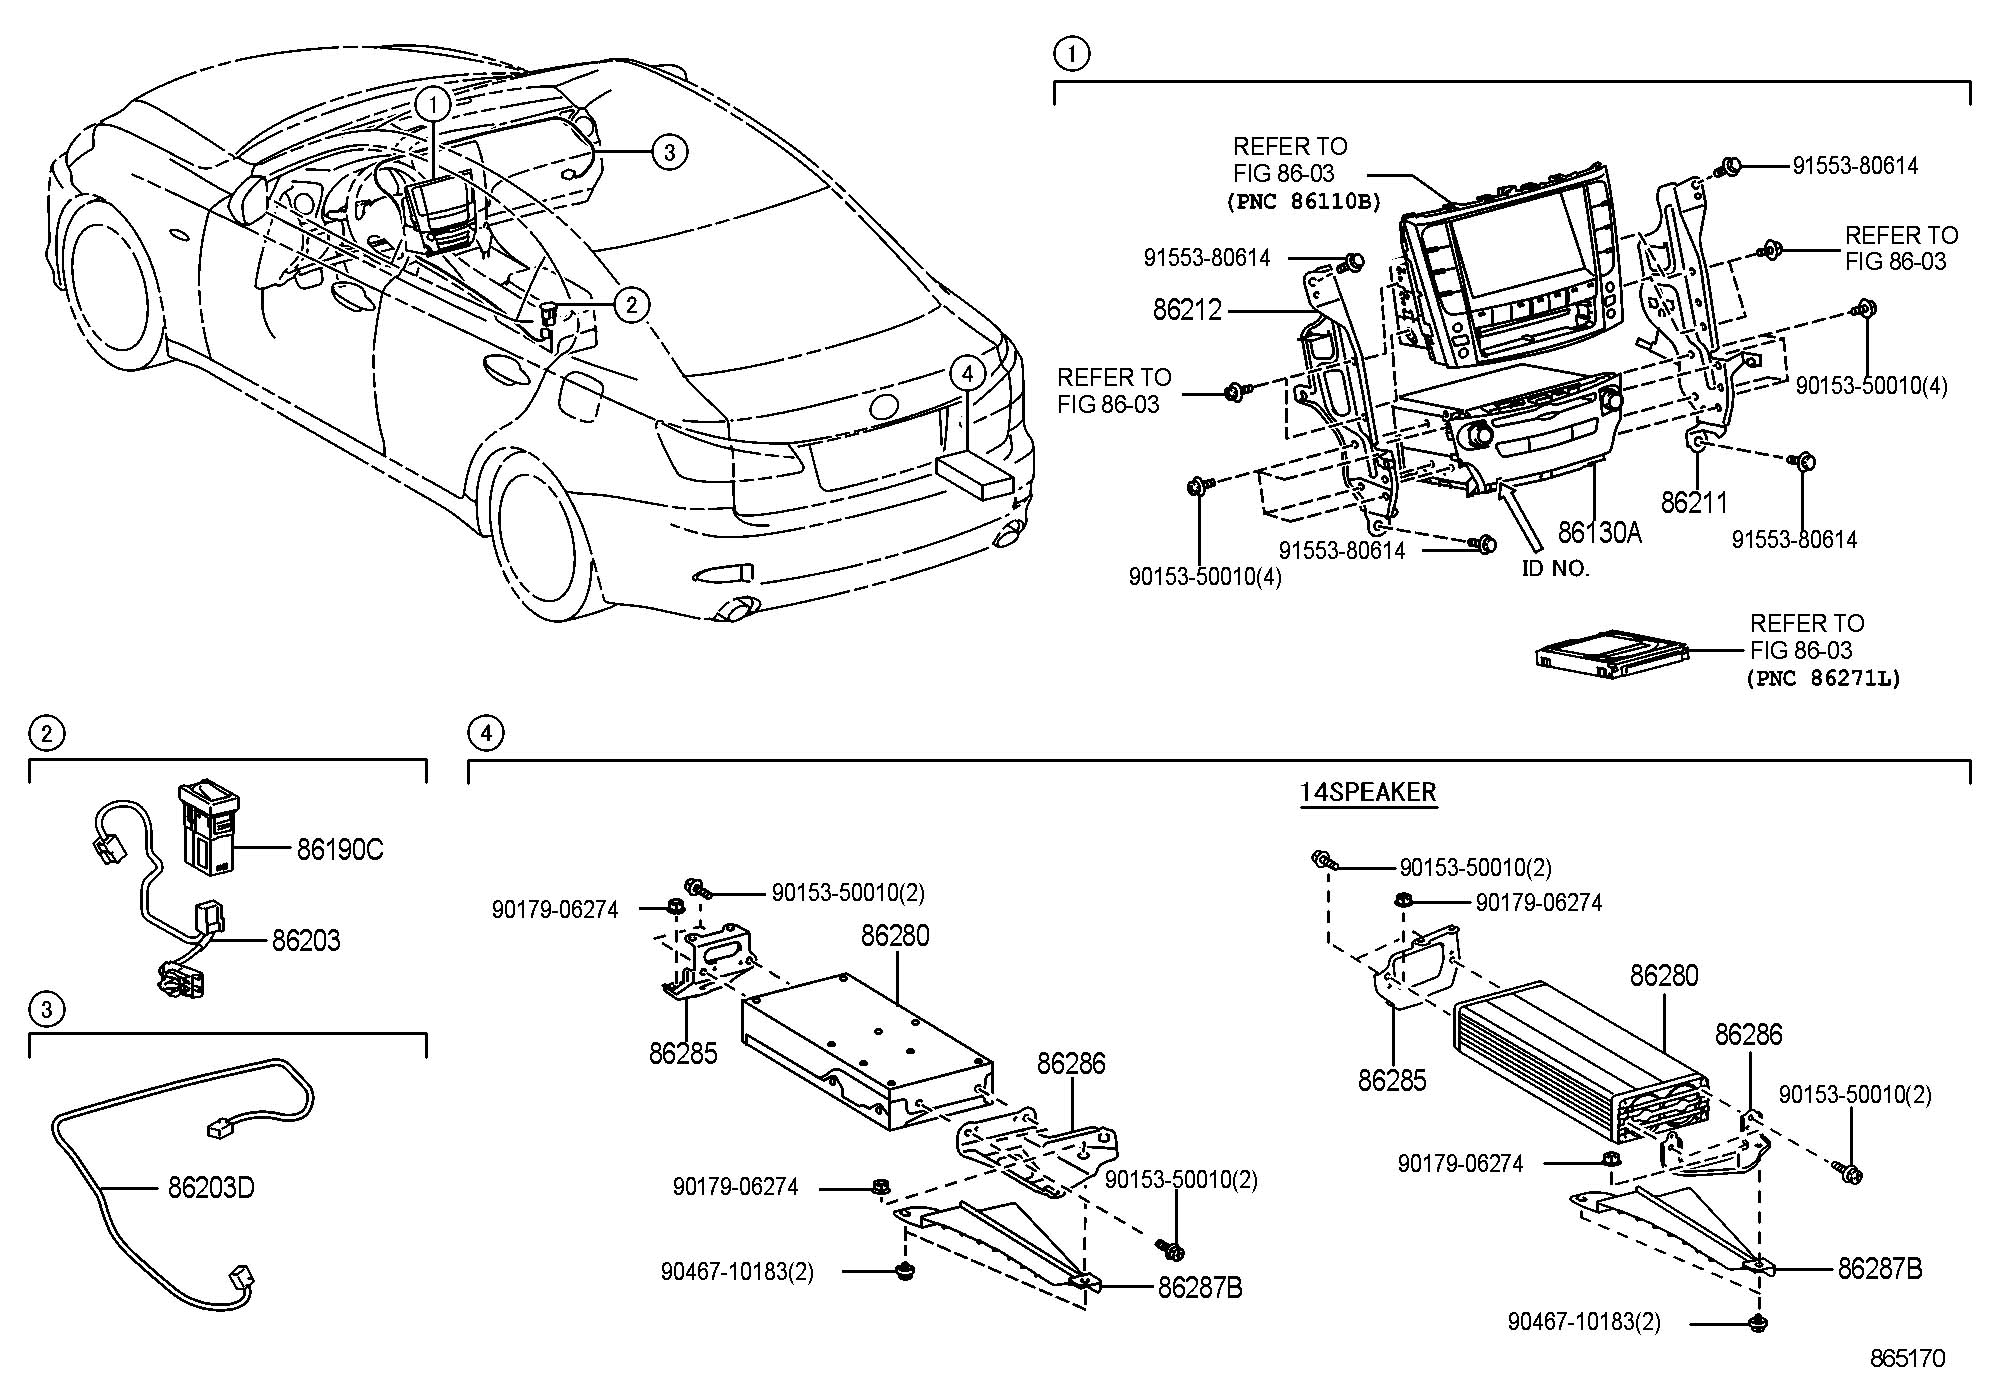 lexus is250 2500cc 24 valve dohc efi manual radio receiver amplifier condenser. Black Bedroom Furniture Sets. Home Design Ideas